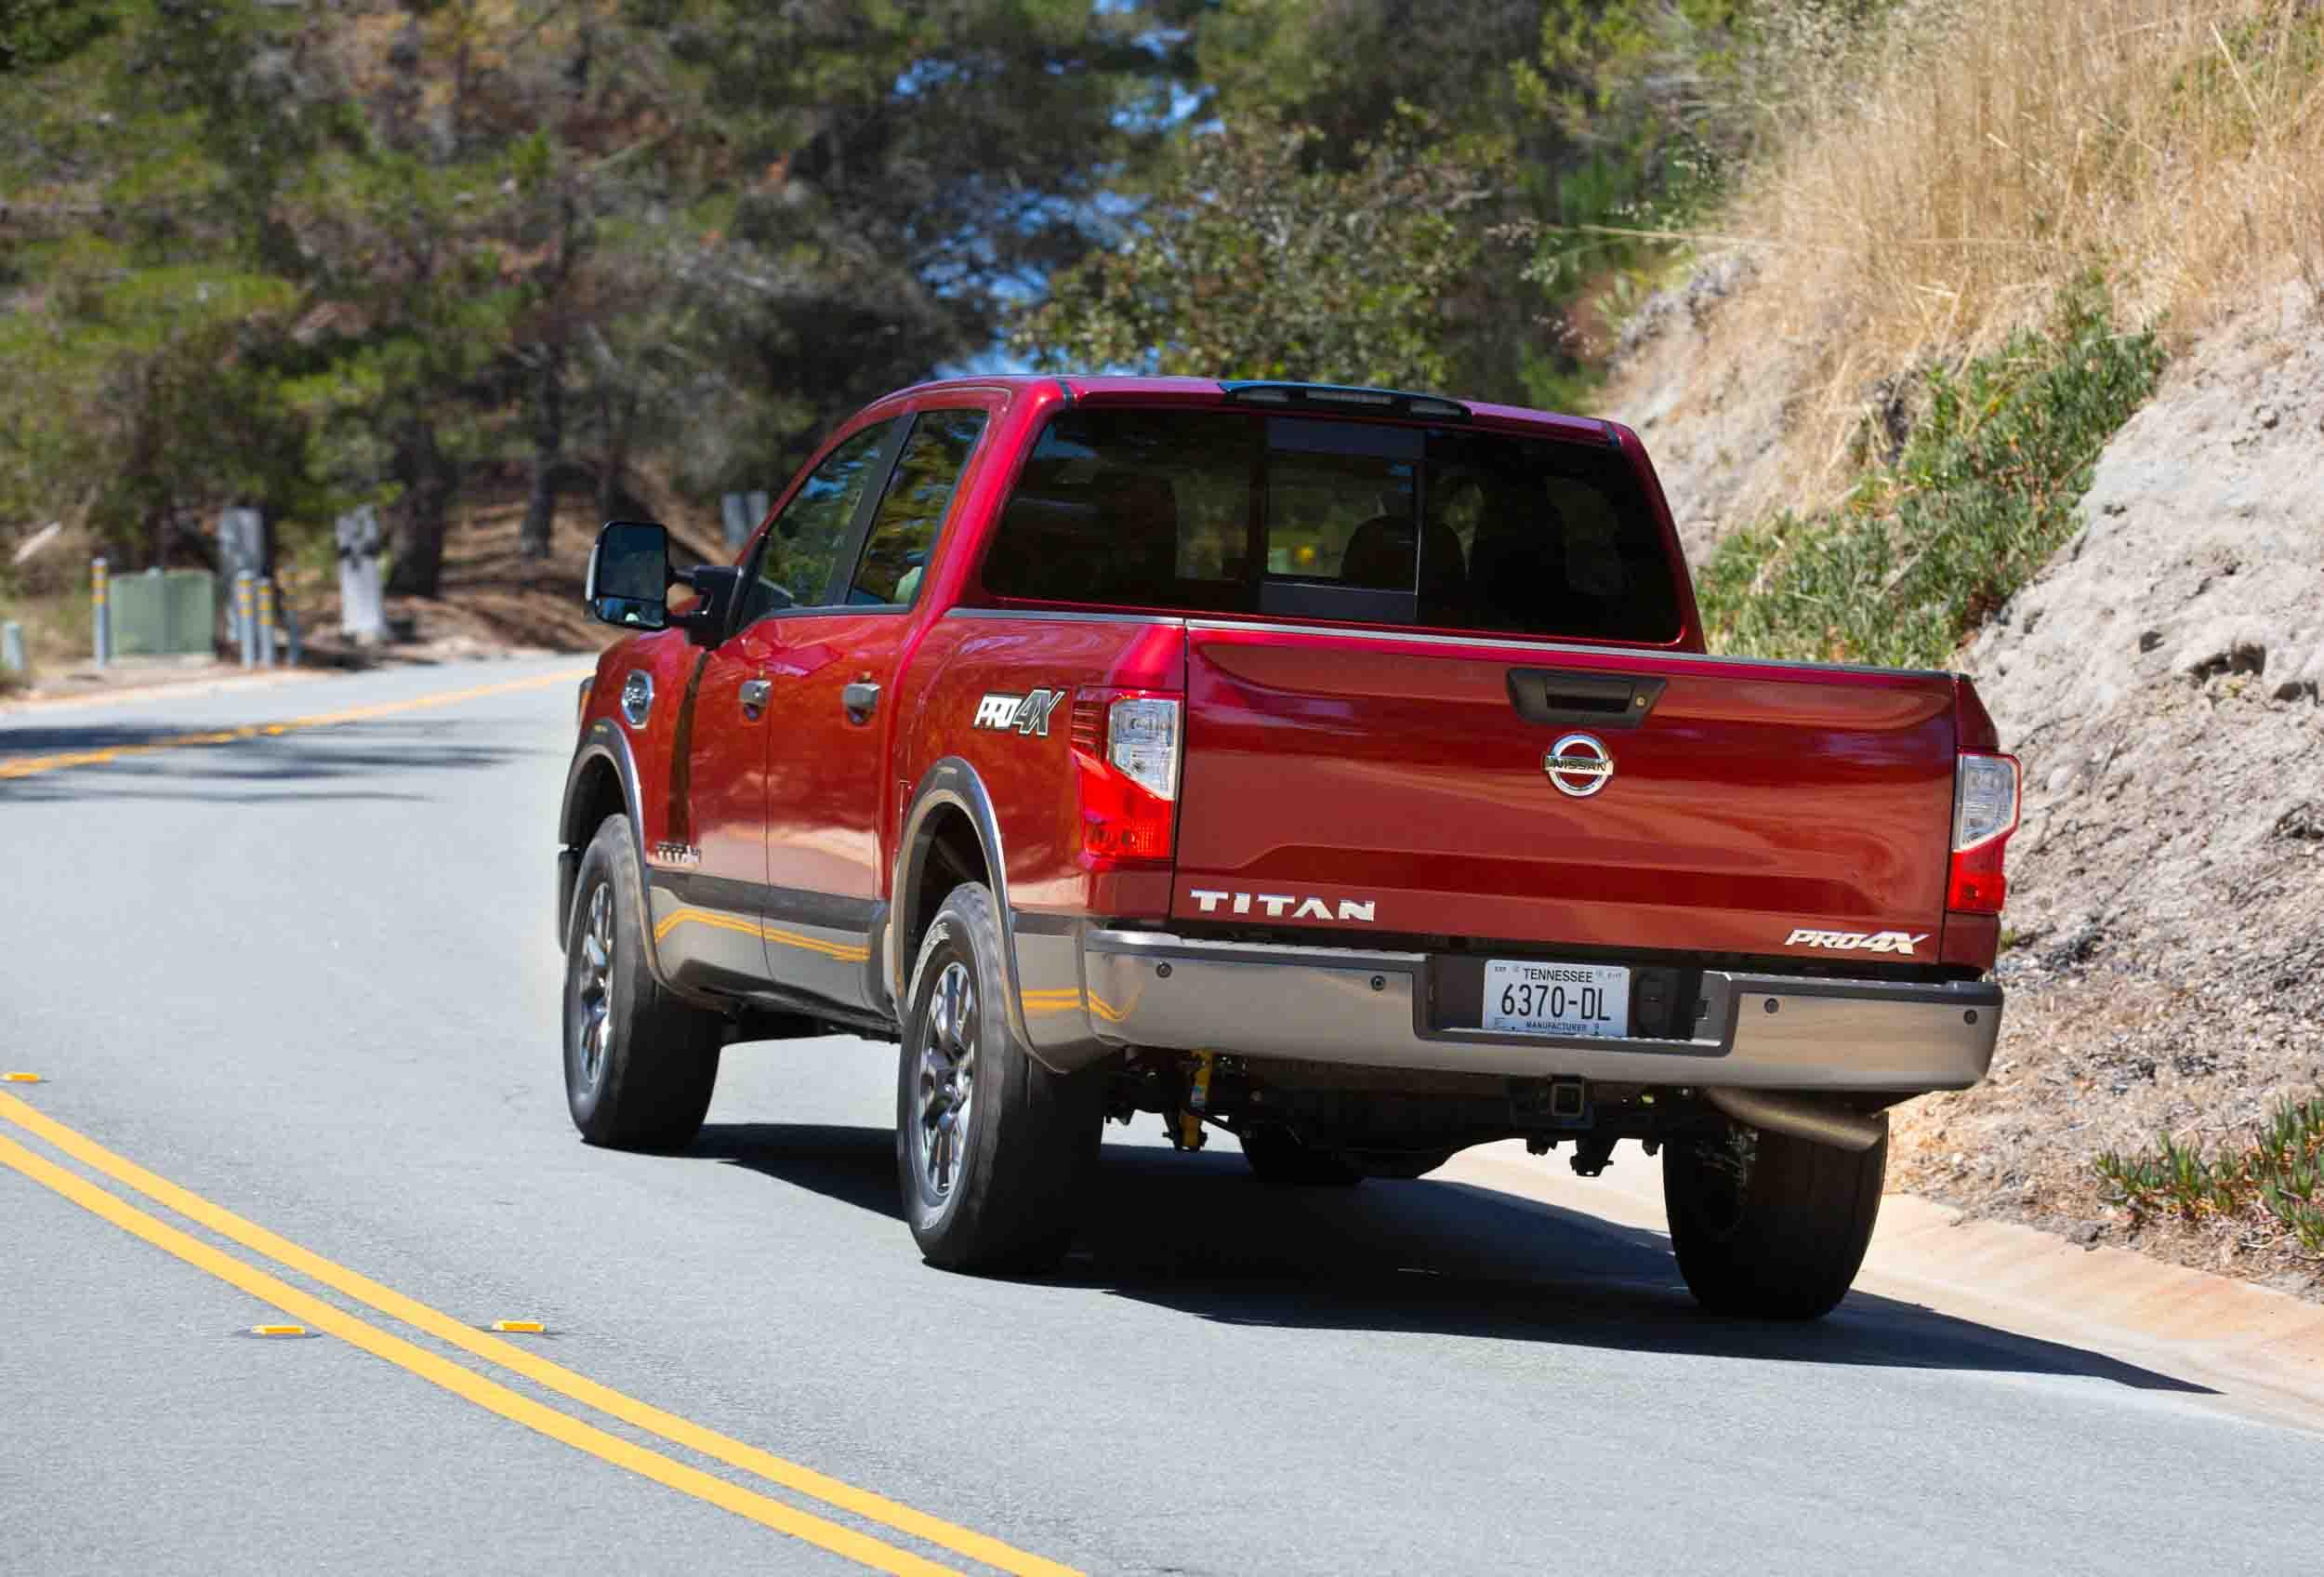 2017 Nissan Titan Pro 4x V 8 4 4 Crew Cab Carfanatics Blog